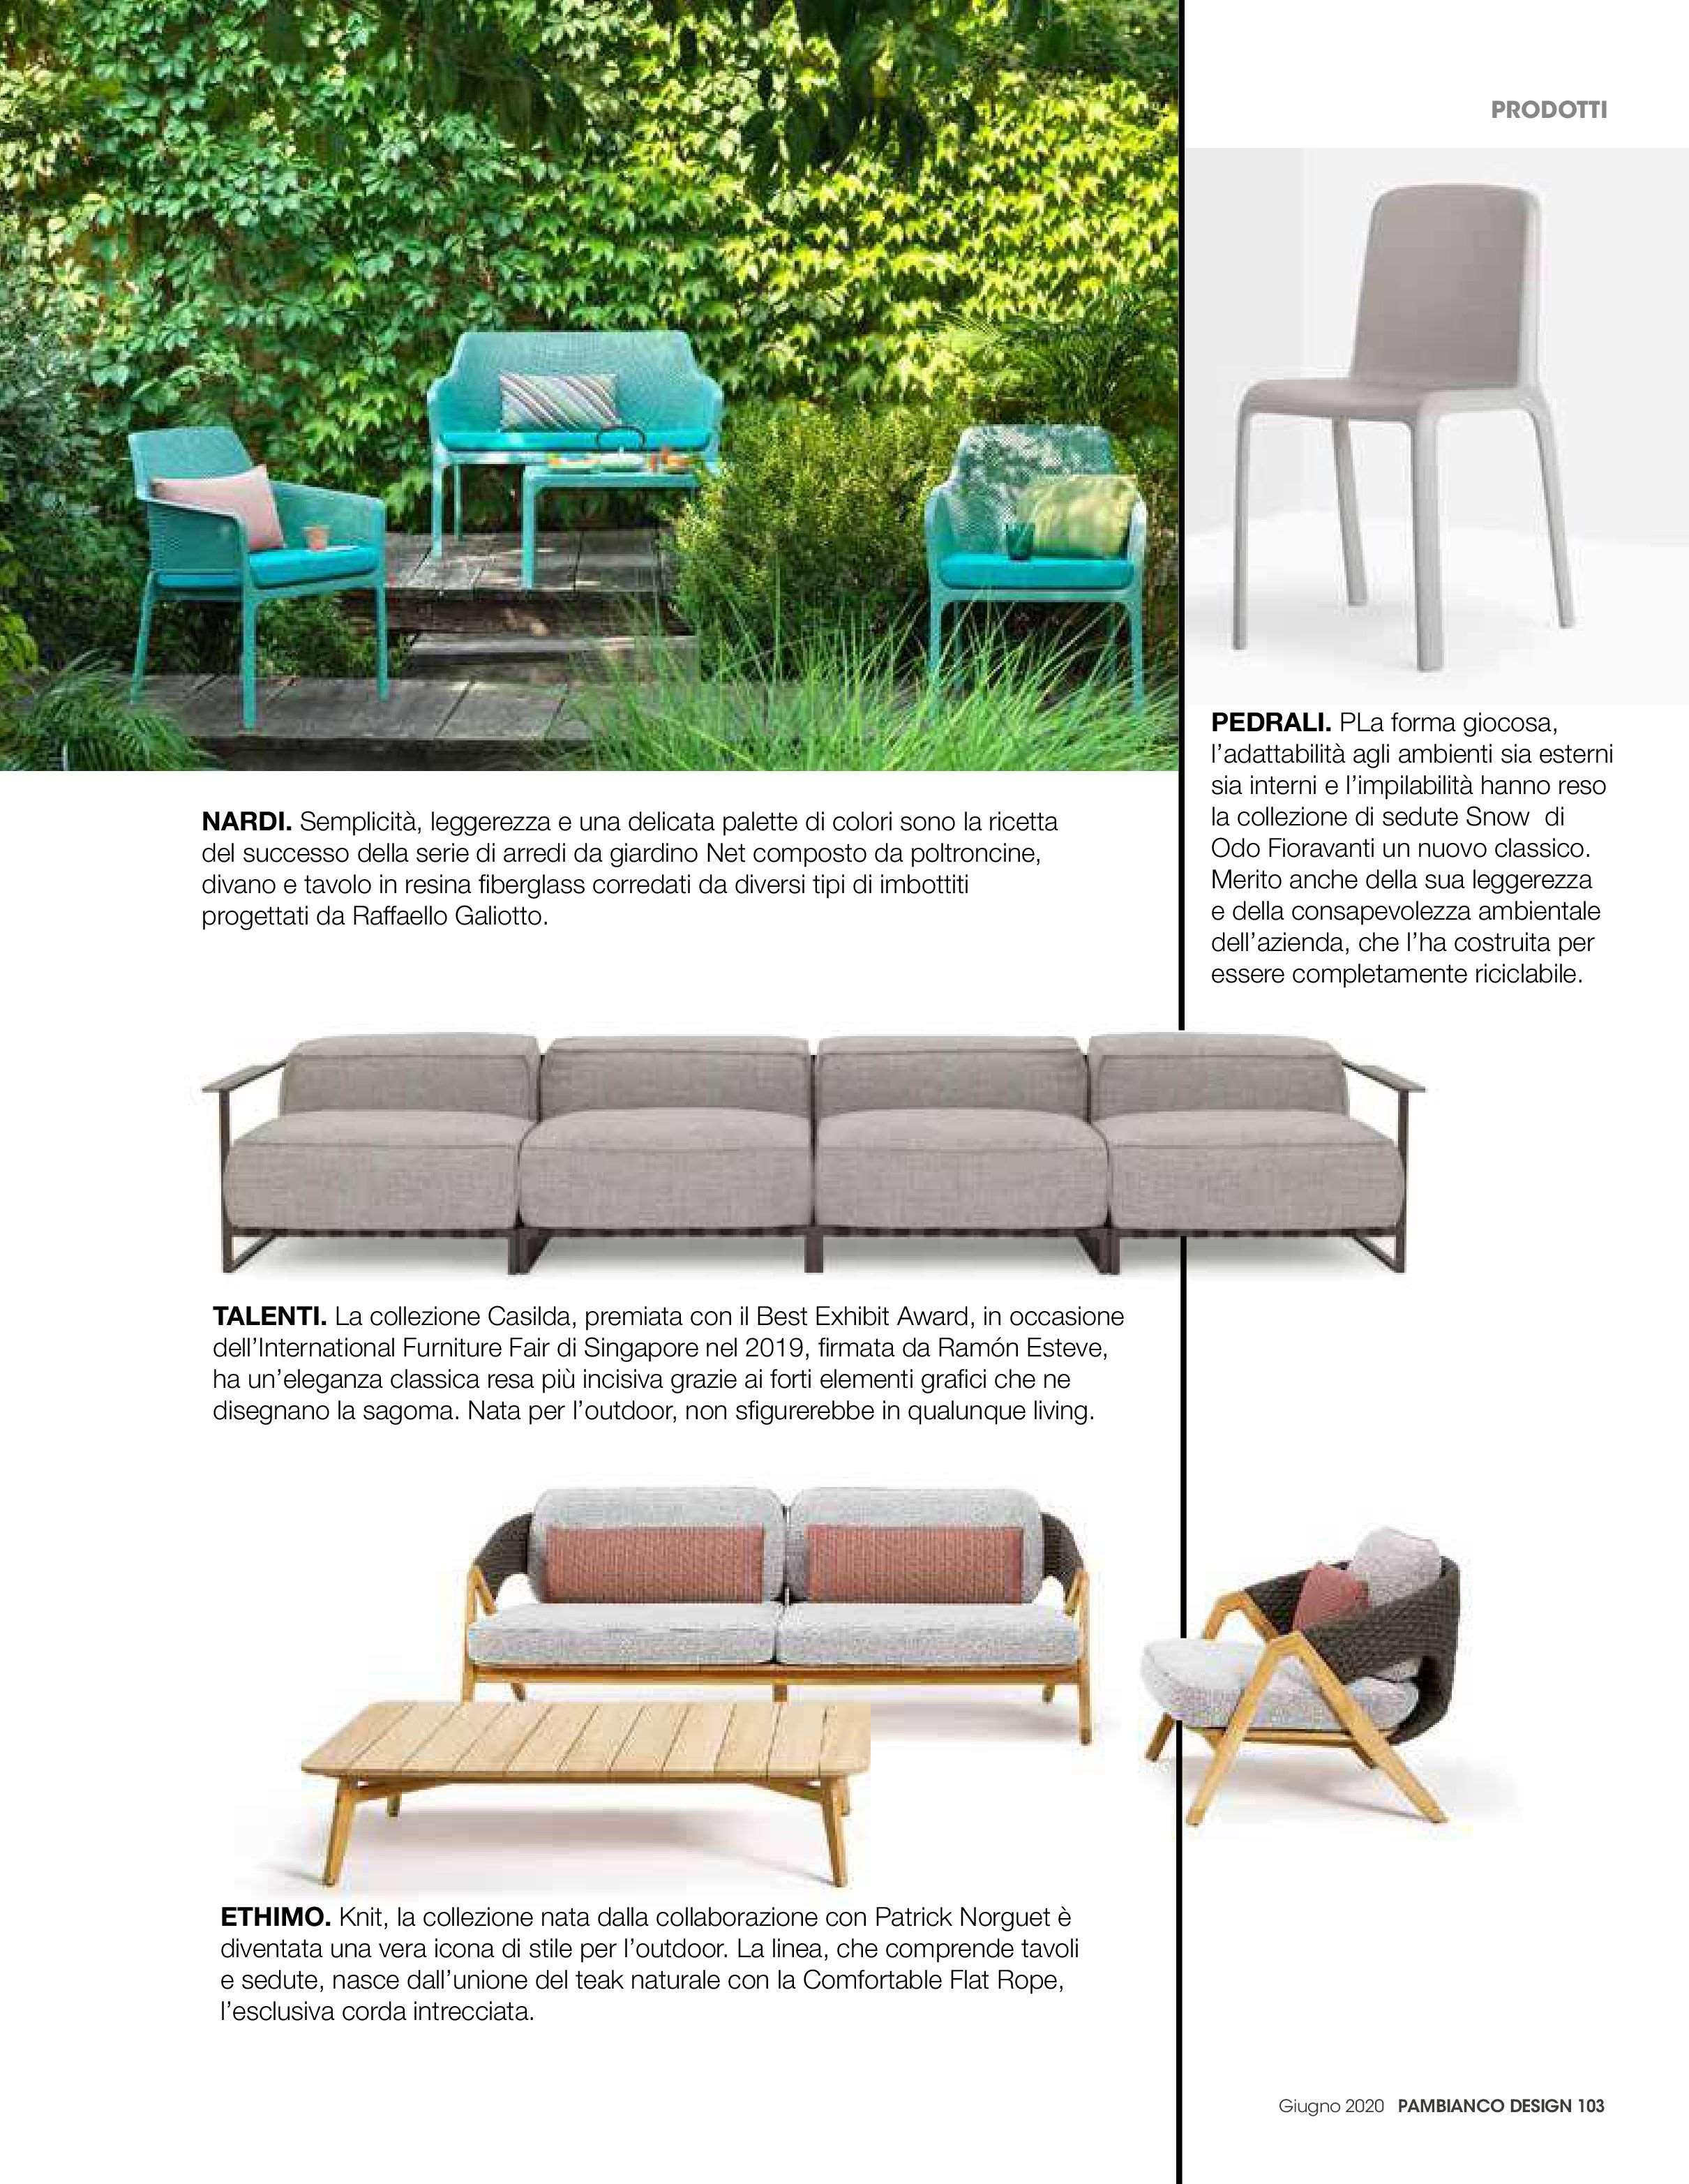 2020.06.01 – Pambianco Magazine IT – Design – pag103